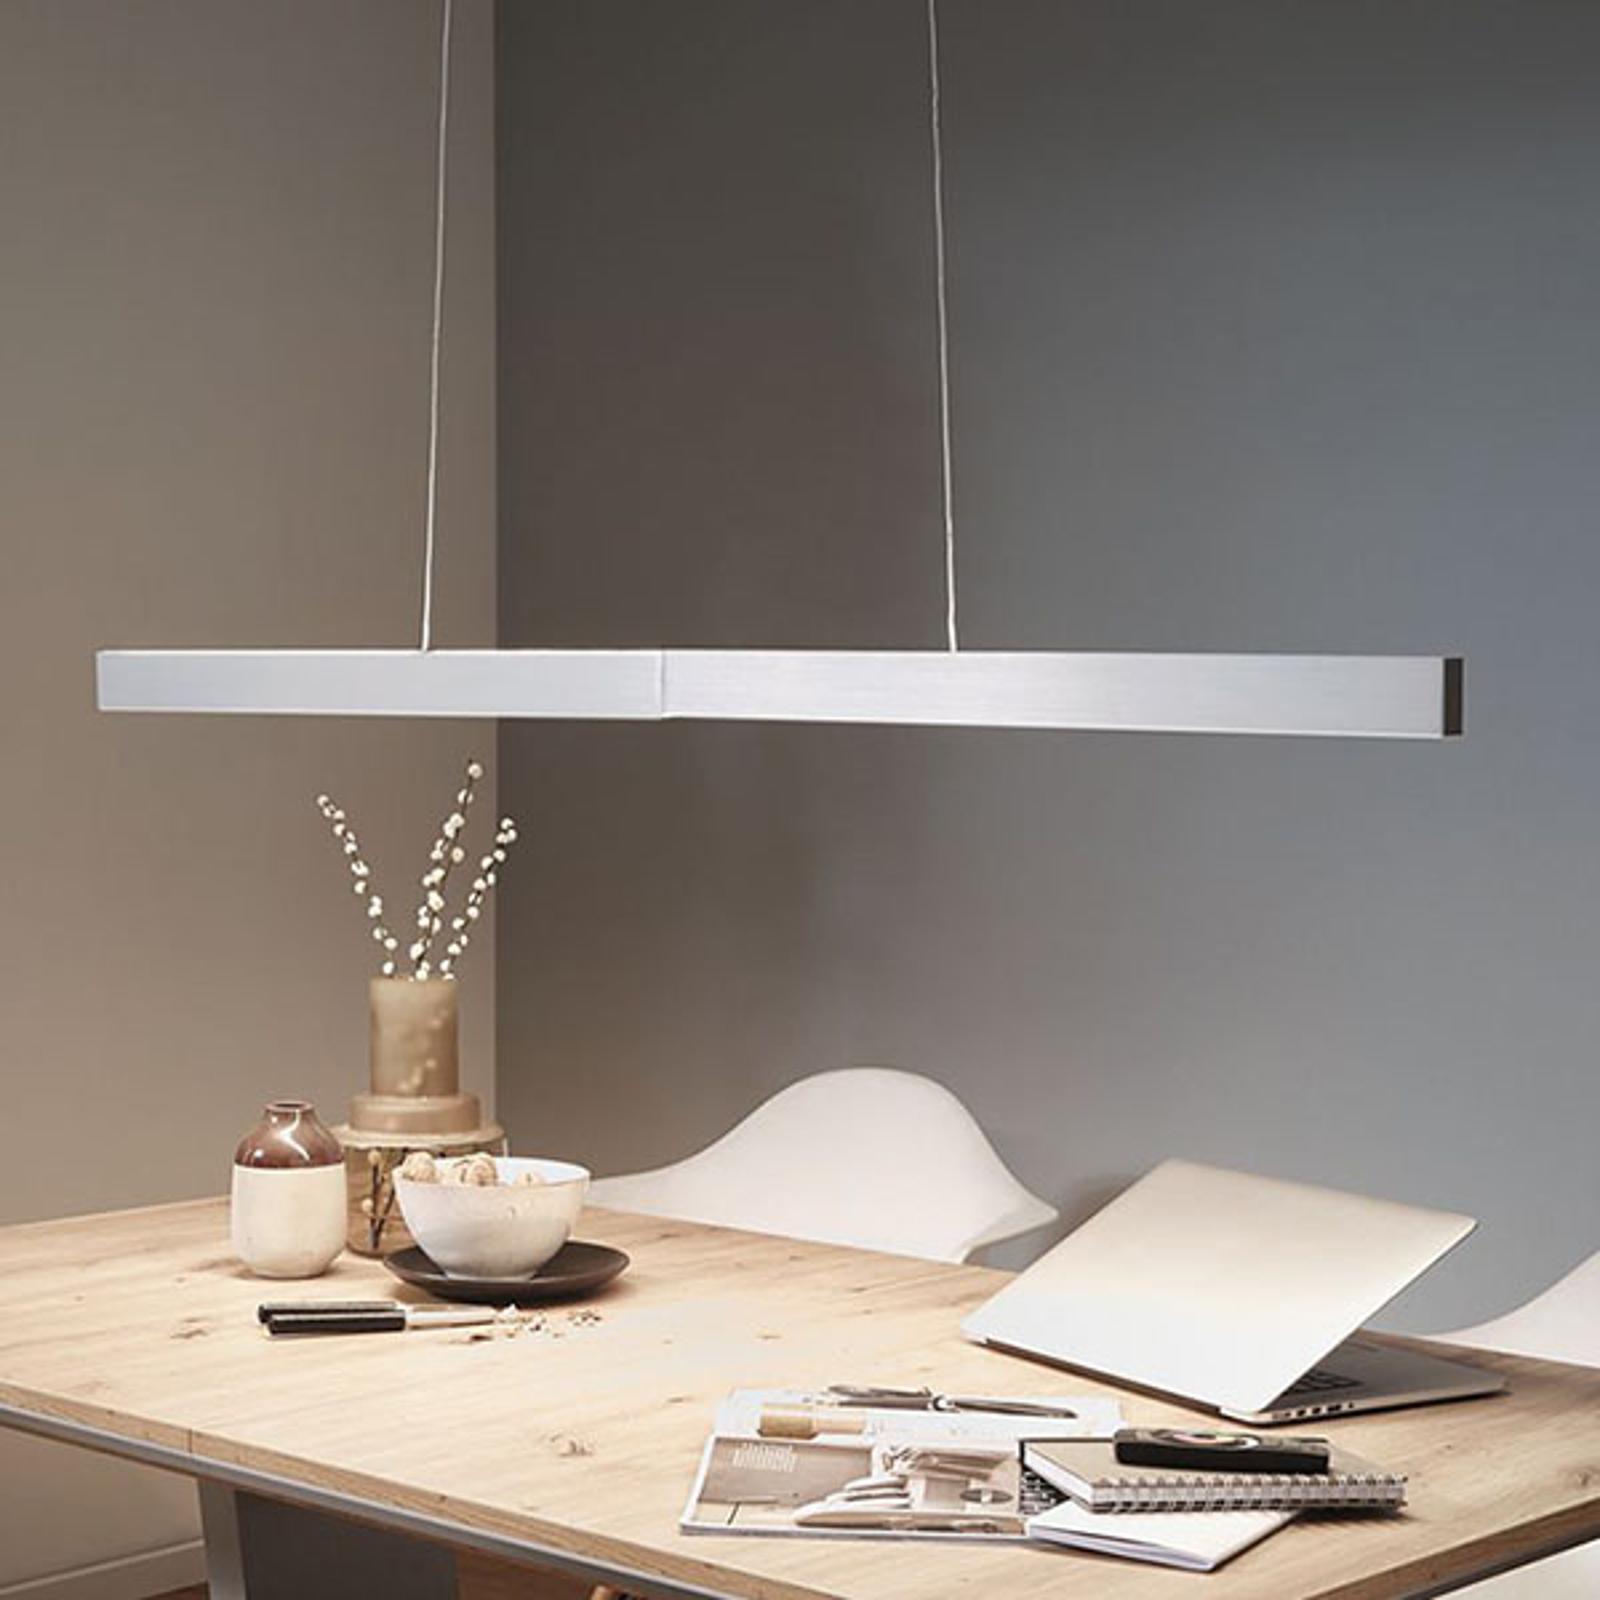 Paulmann Aptare LED hanging lamp ZigBee adjustable_7602359_1